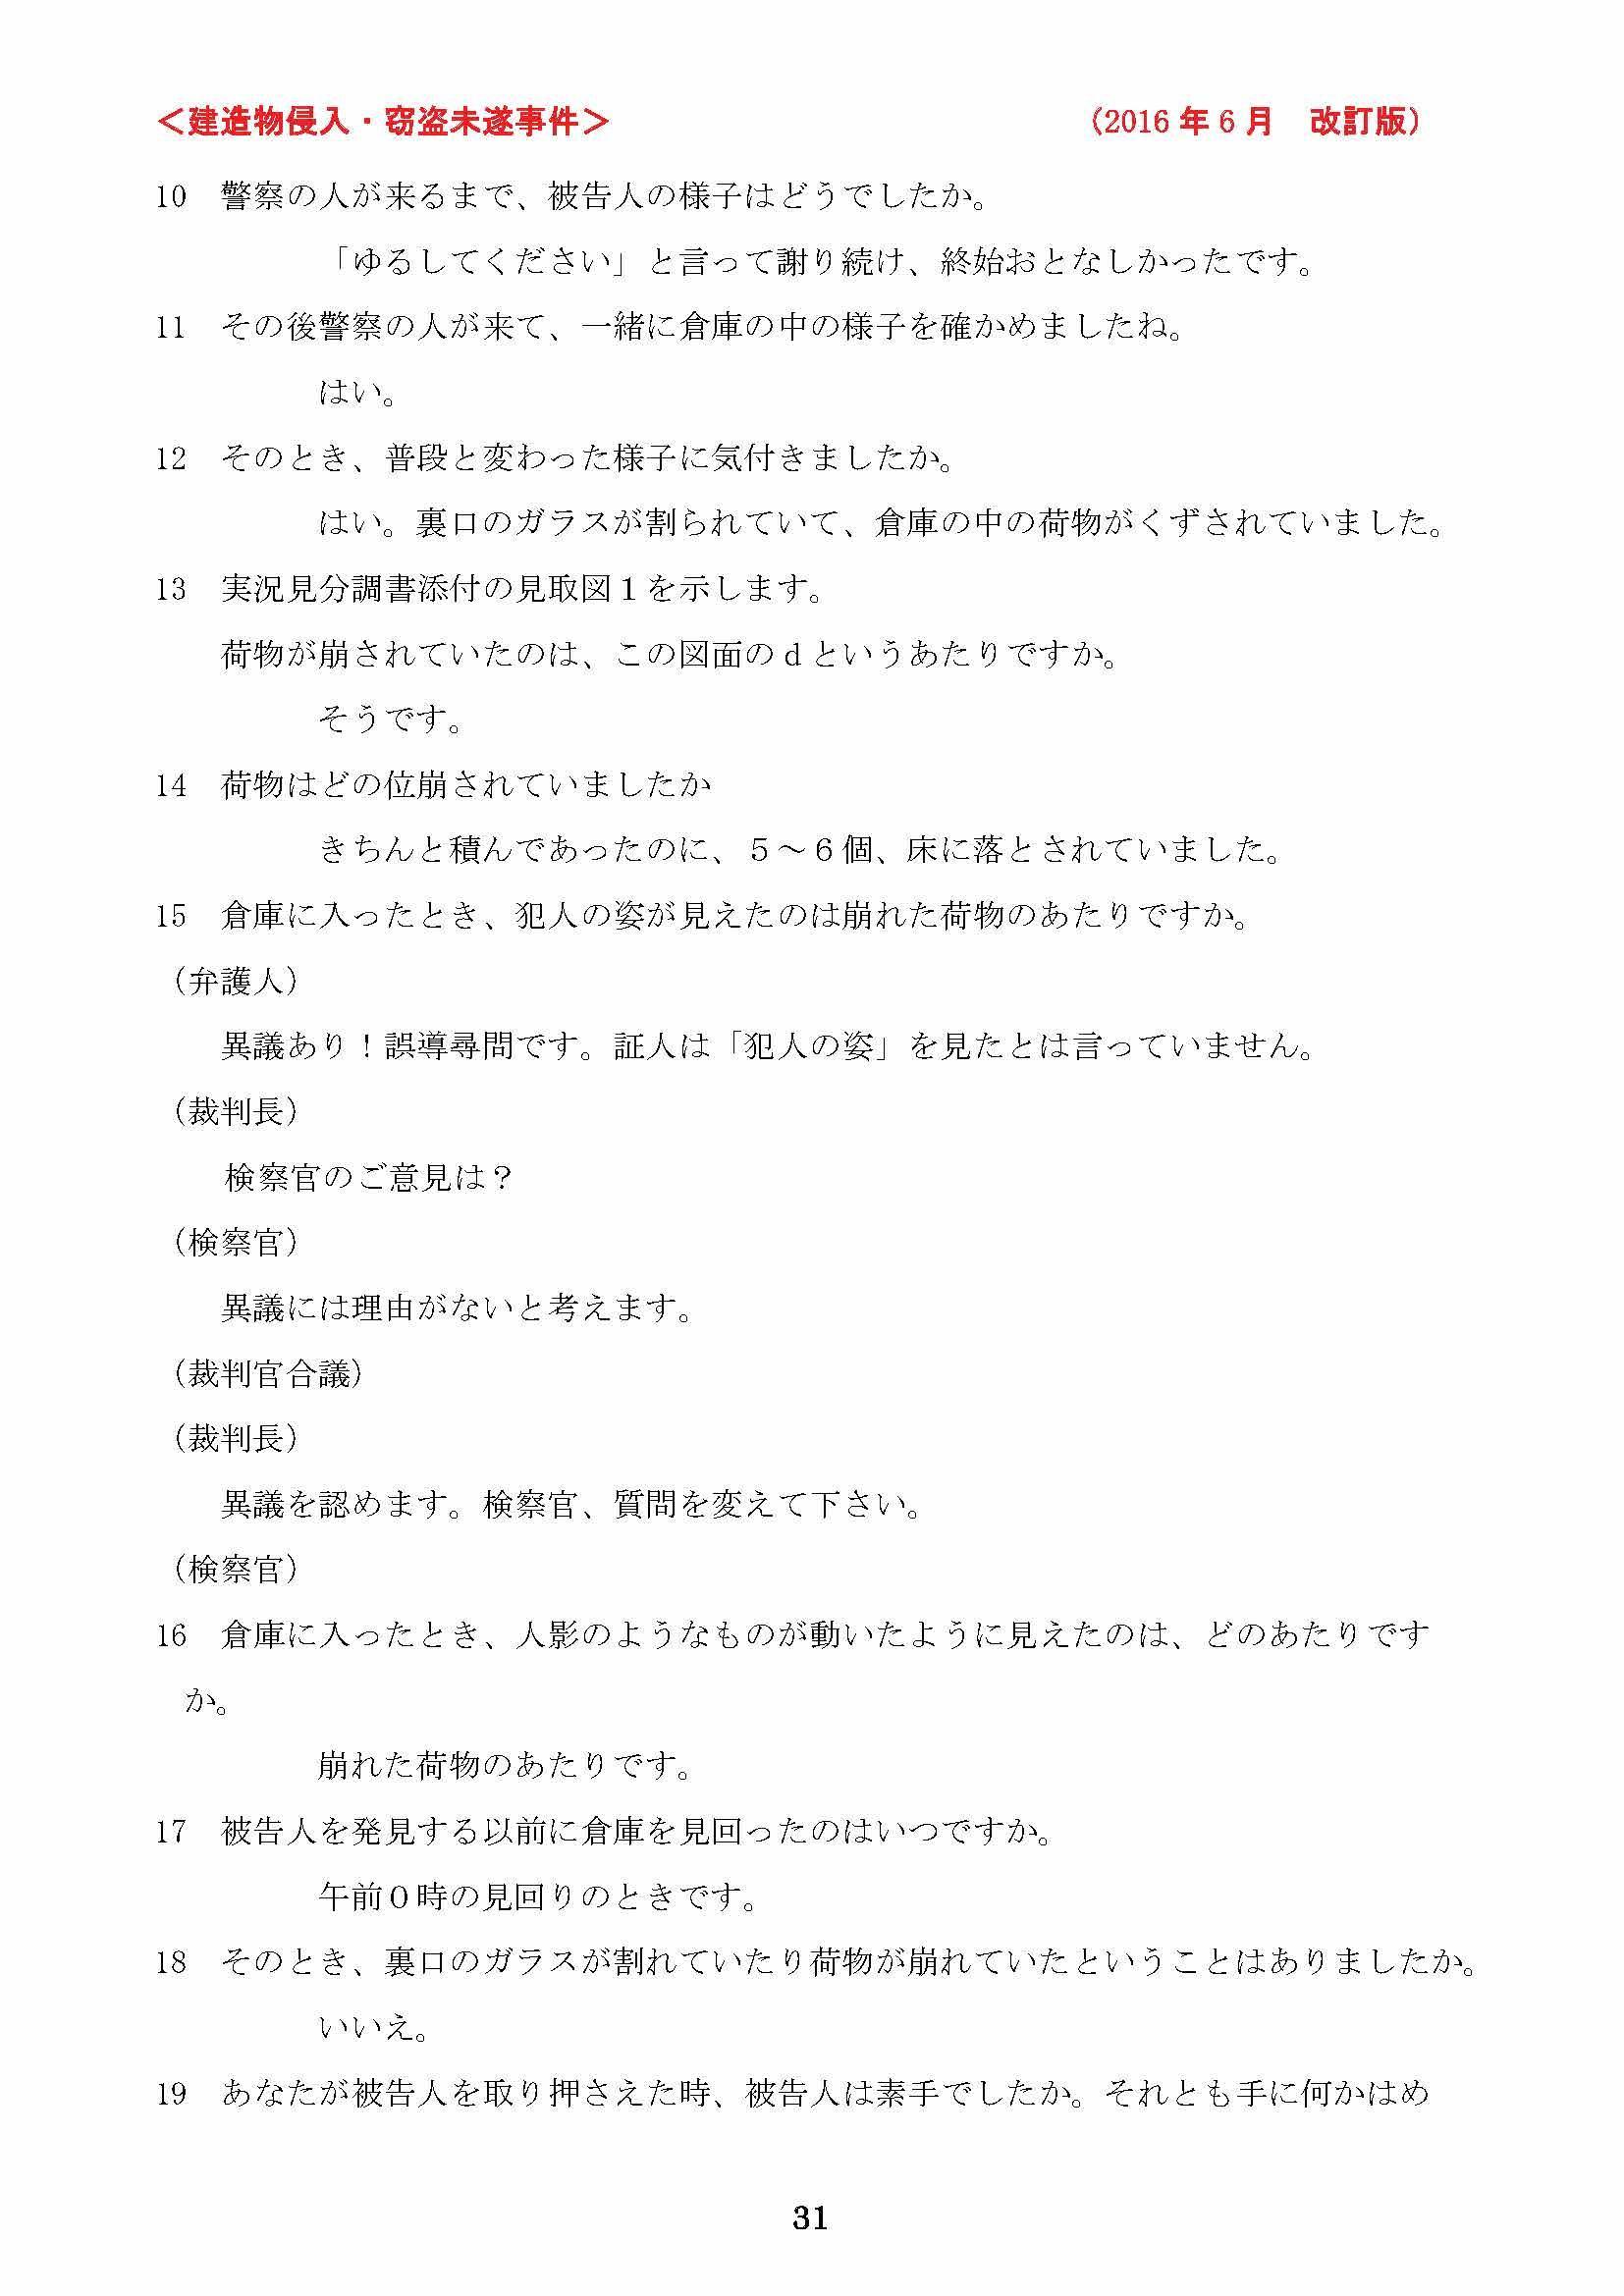 kenzoubutsu_5.jpg